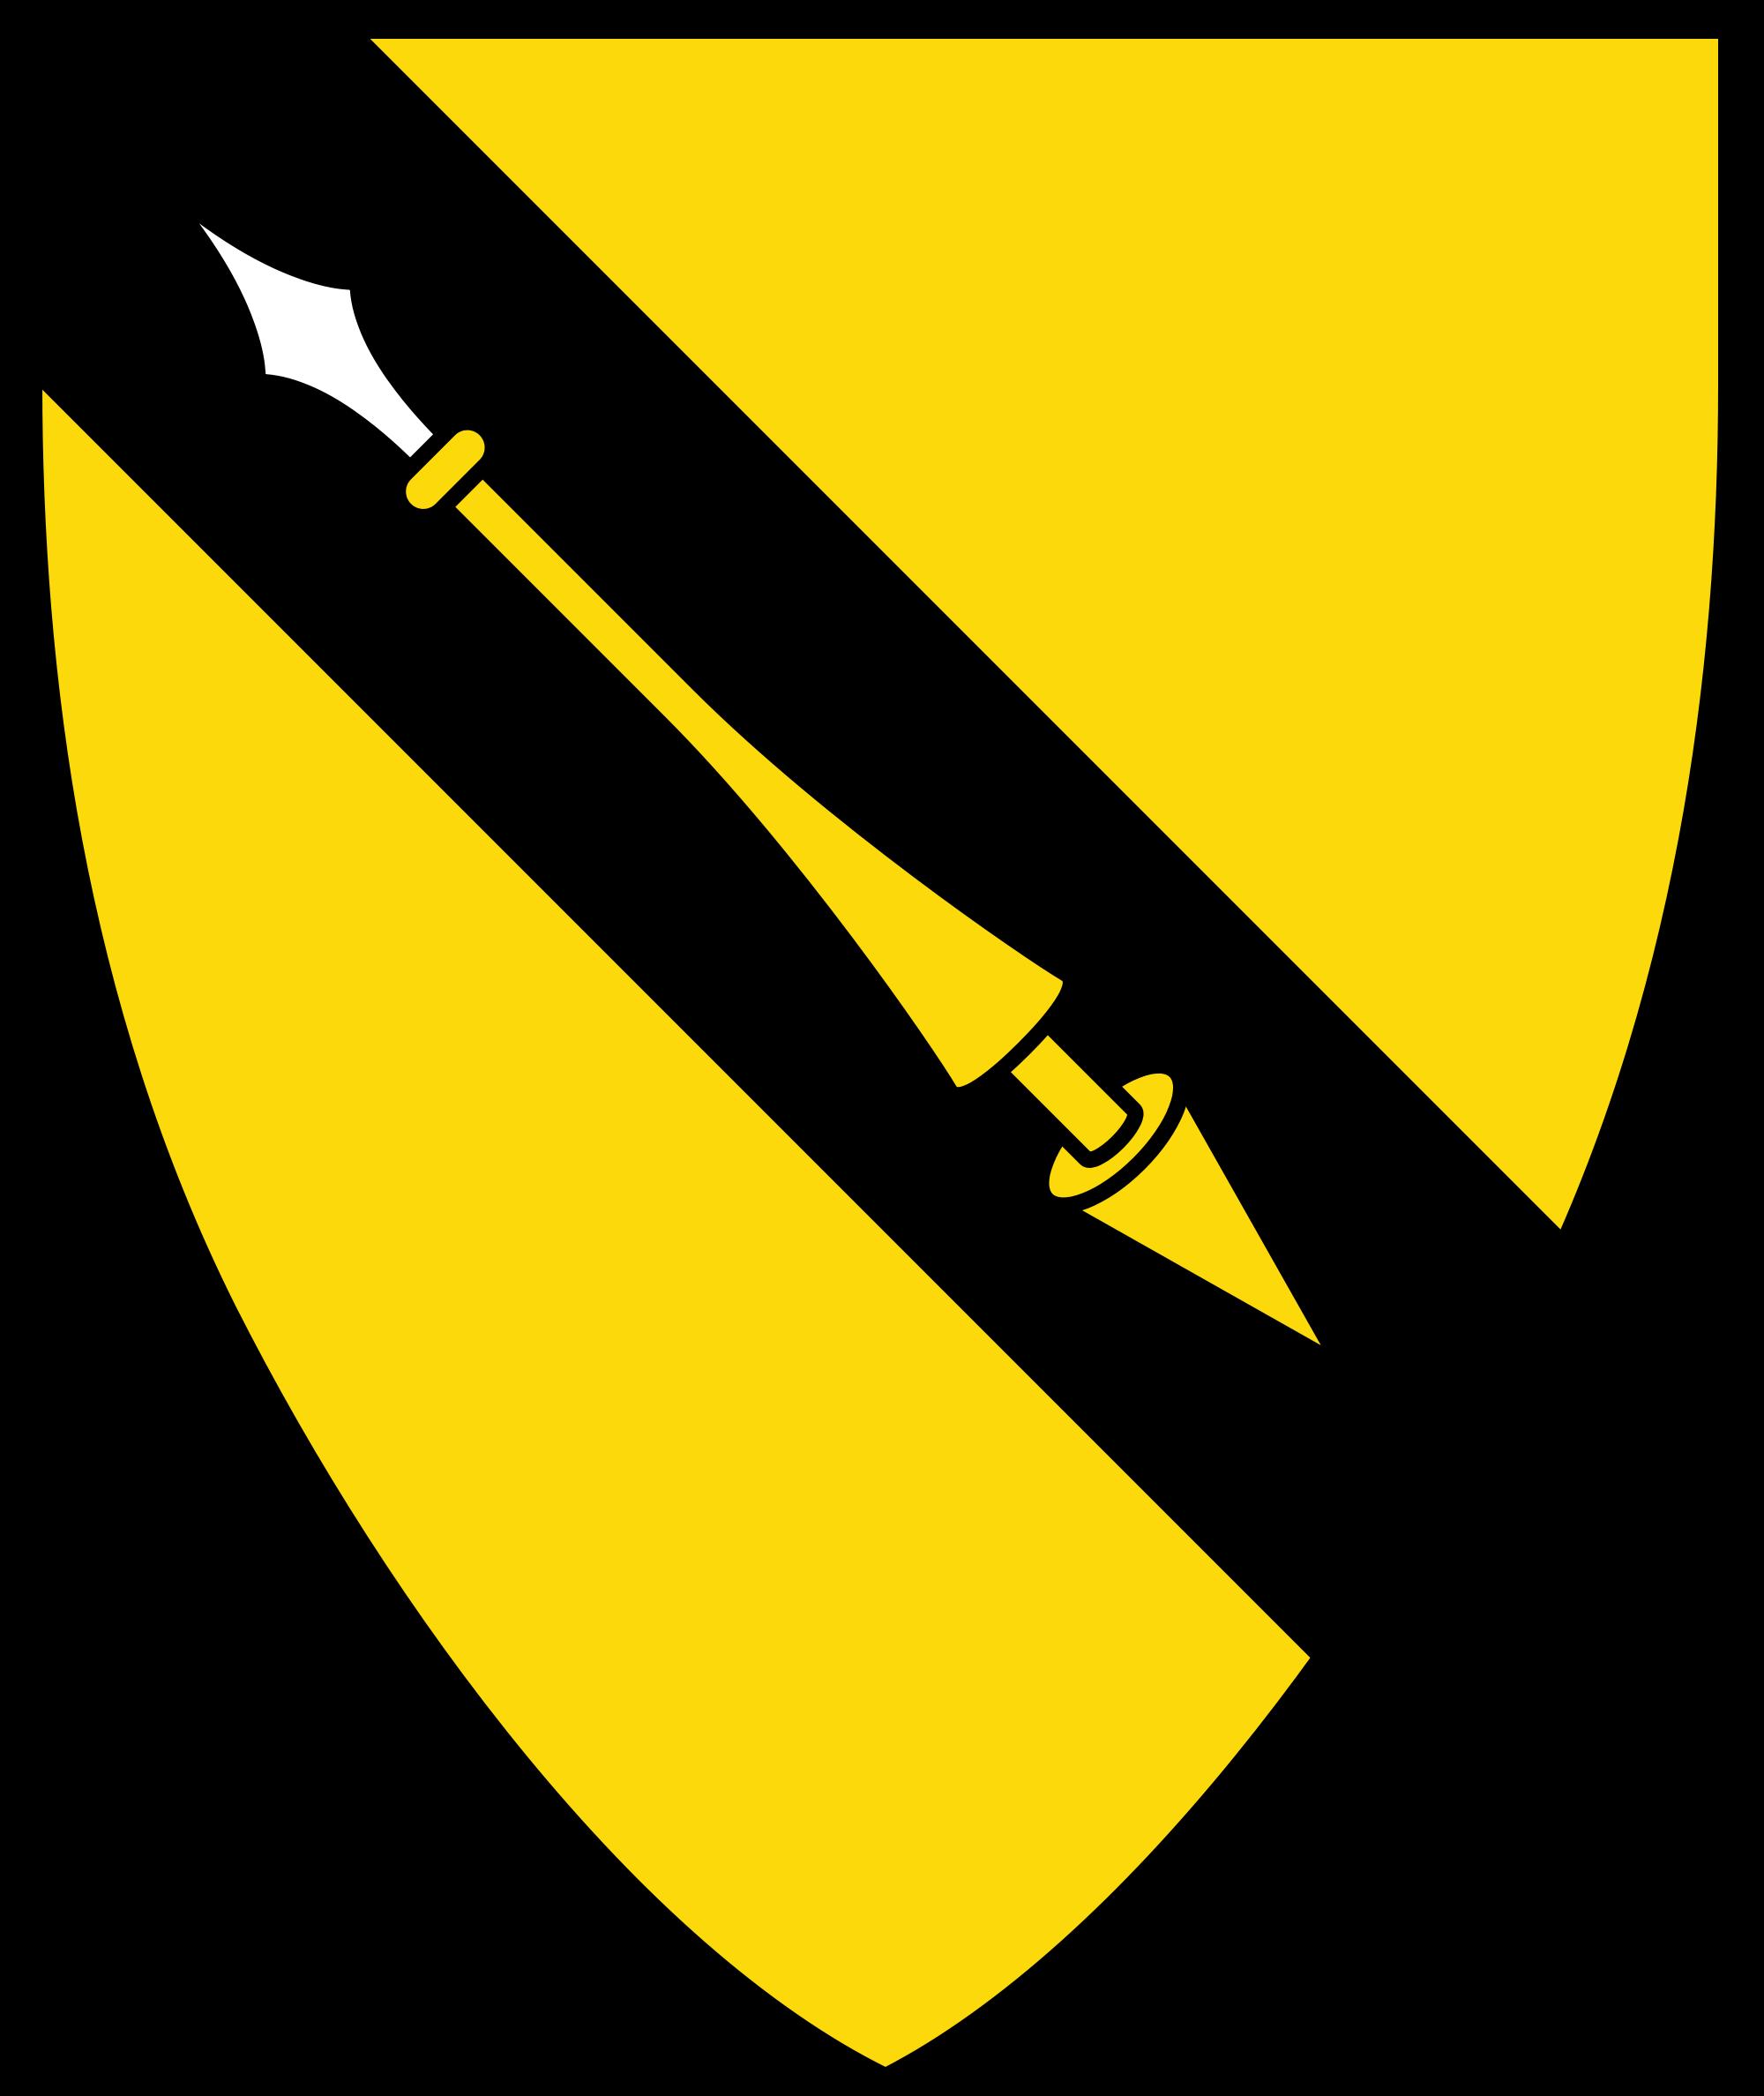 File of arms william. Falcon clipart coat arm